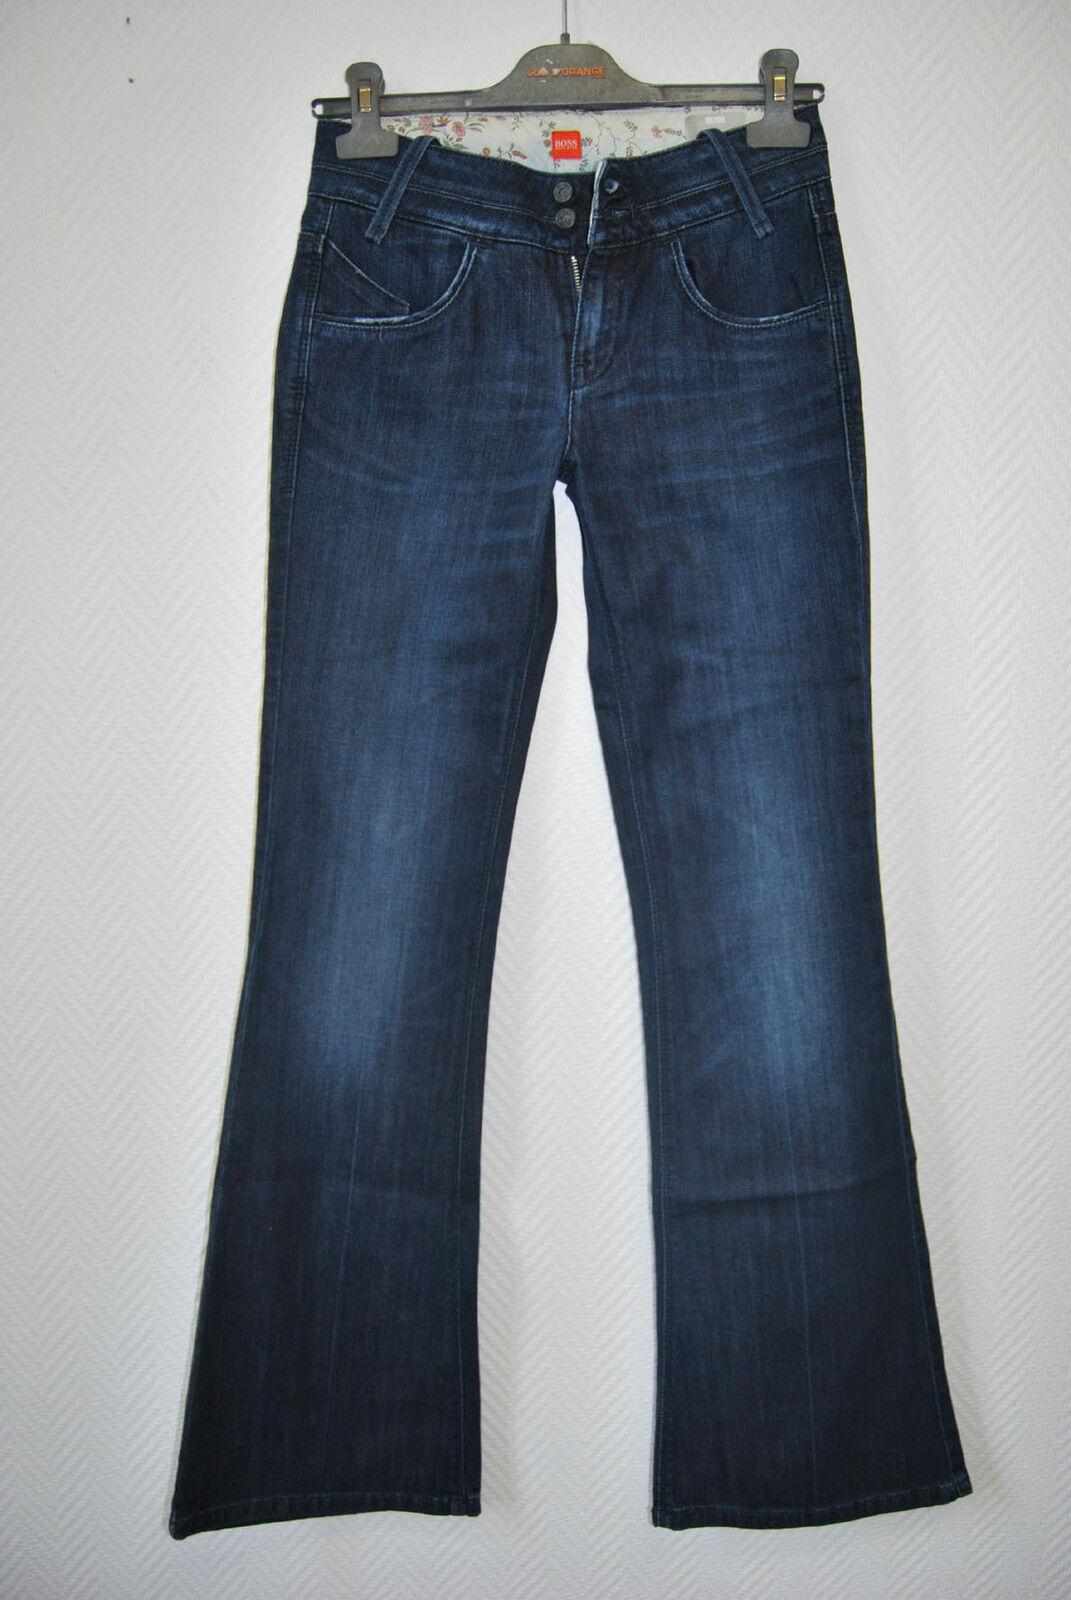 HUGO BOSS Jeans Gr 34 36 Hose Damen 26 32 EDEL dunkelblau 179,- STRETCH D1307